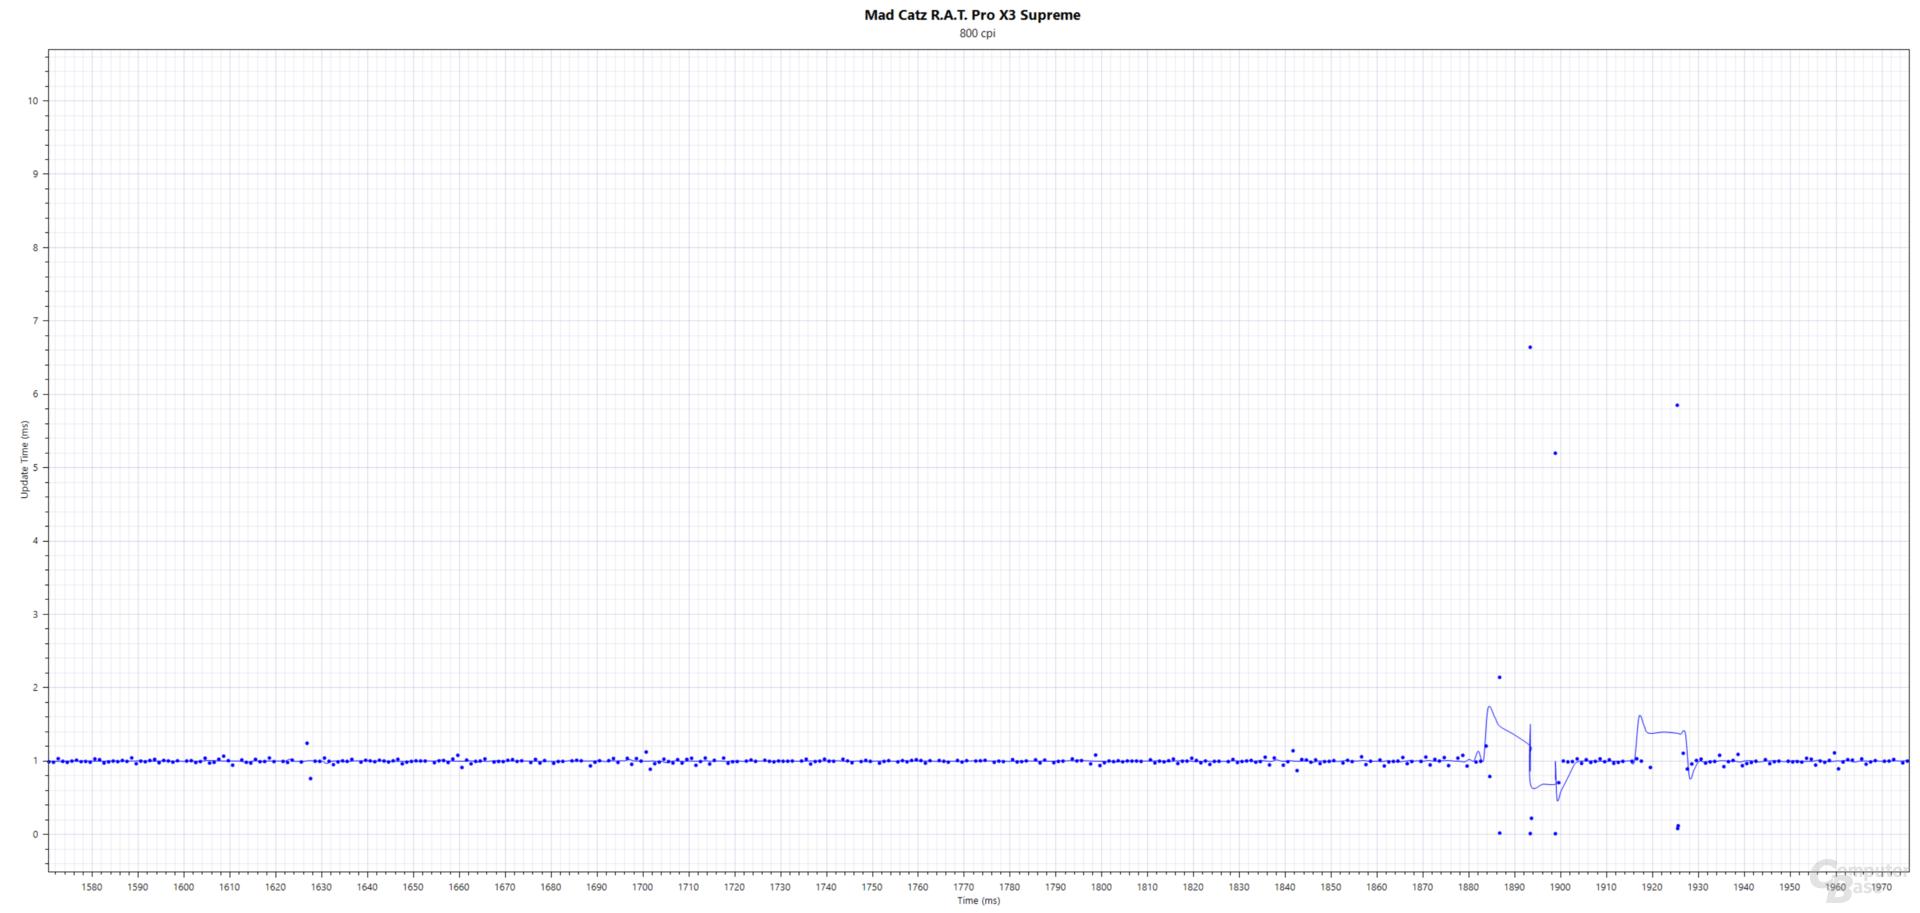 Intervall(ms); Mad Catz R.A.T. Pro X3 Supreme (PixArt PMW-3389, 800 cpi, 1.000 Hertz, Stoffmauspad)